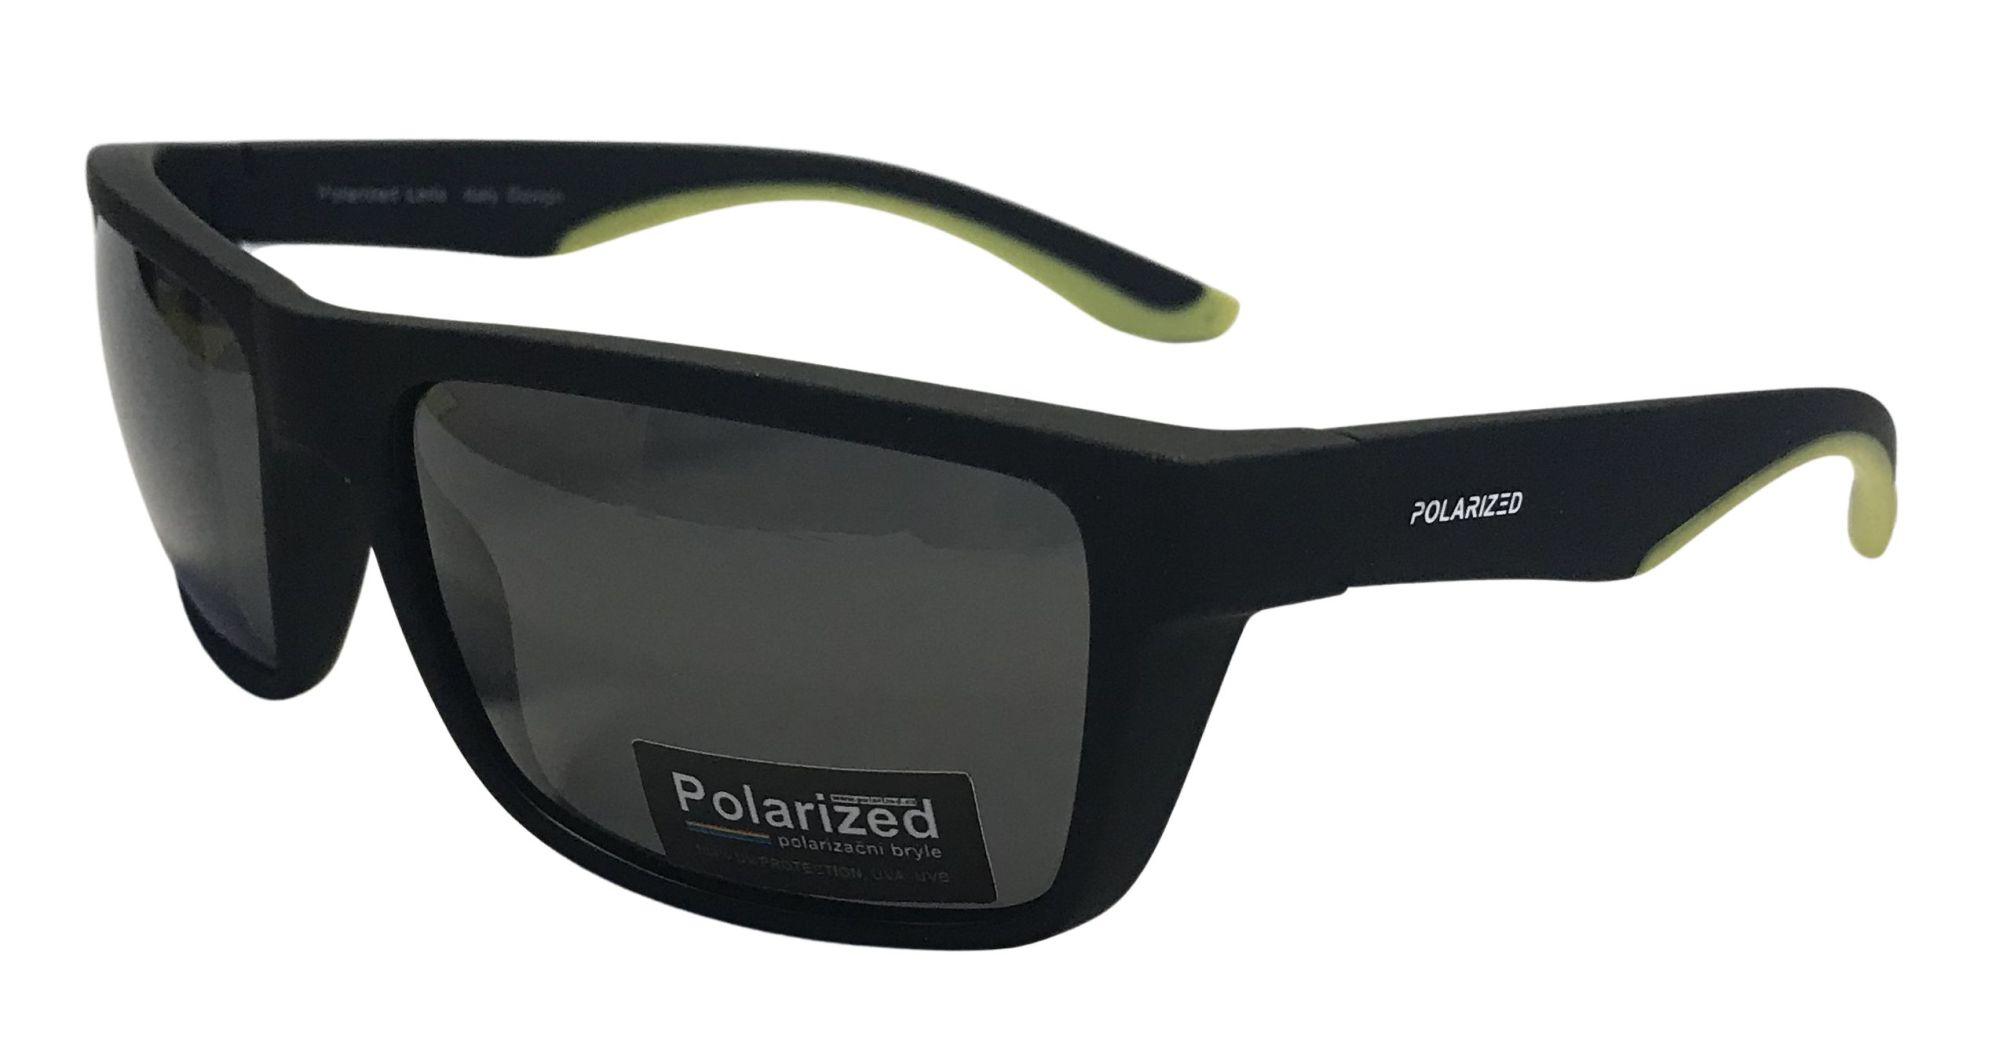 Coyote Vision Brýle FASHION polarizační černé matné SGLPO2.180 (0x)